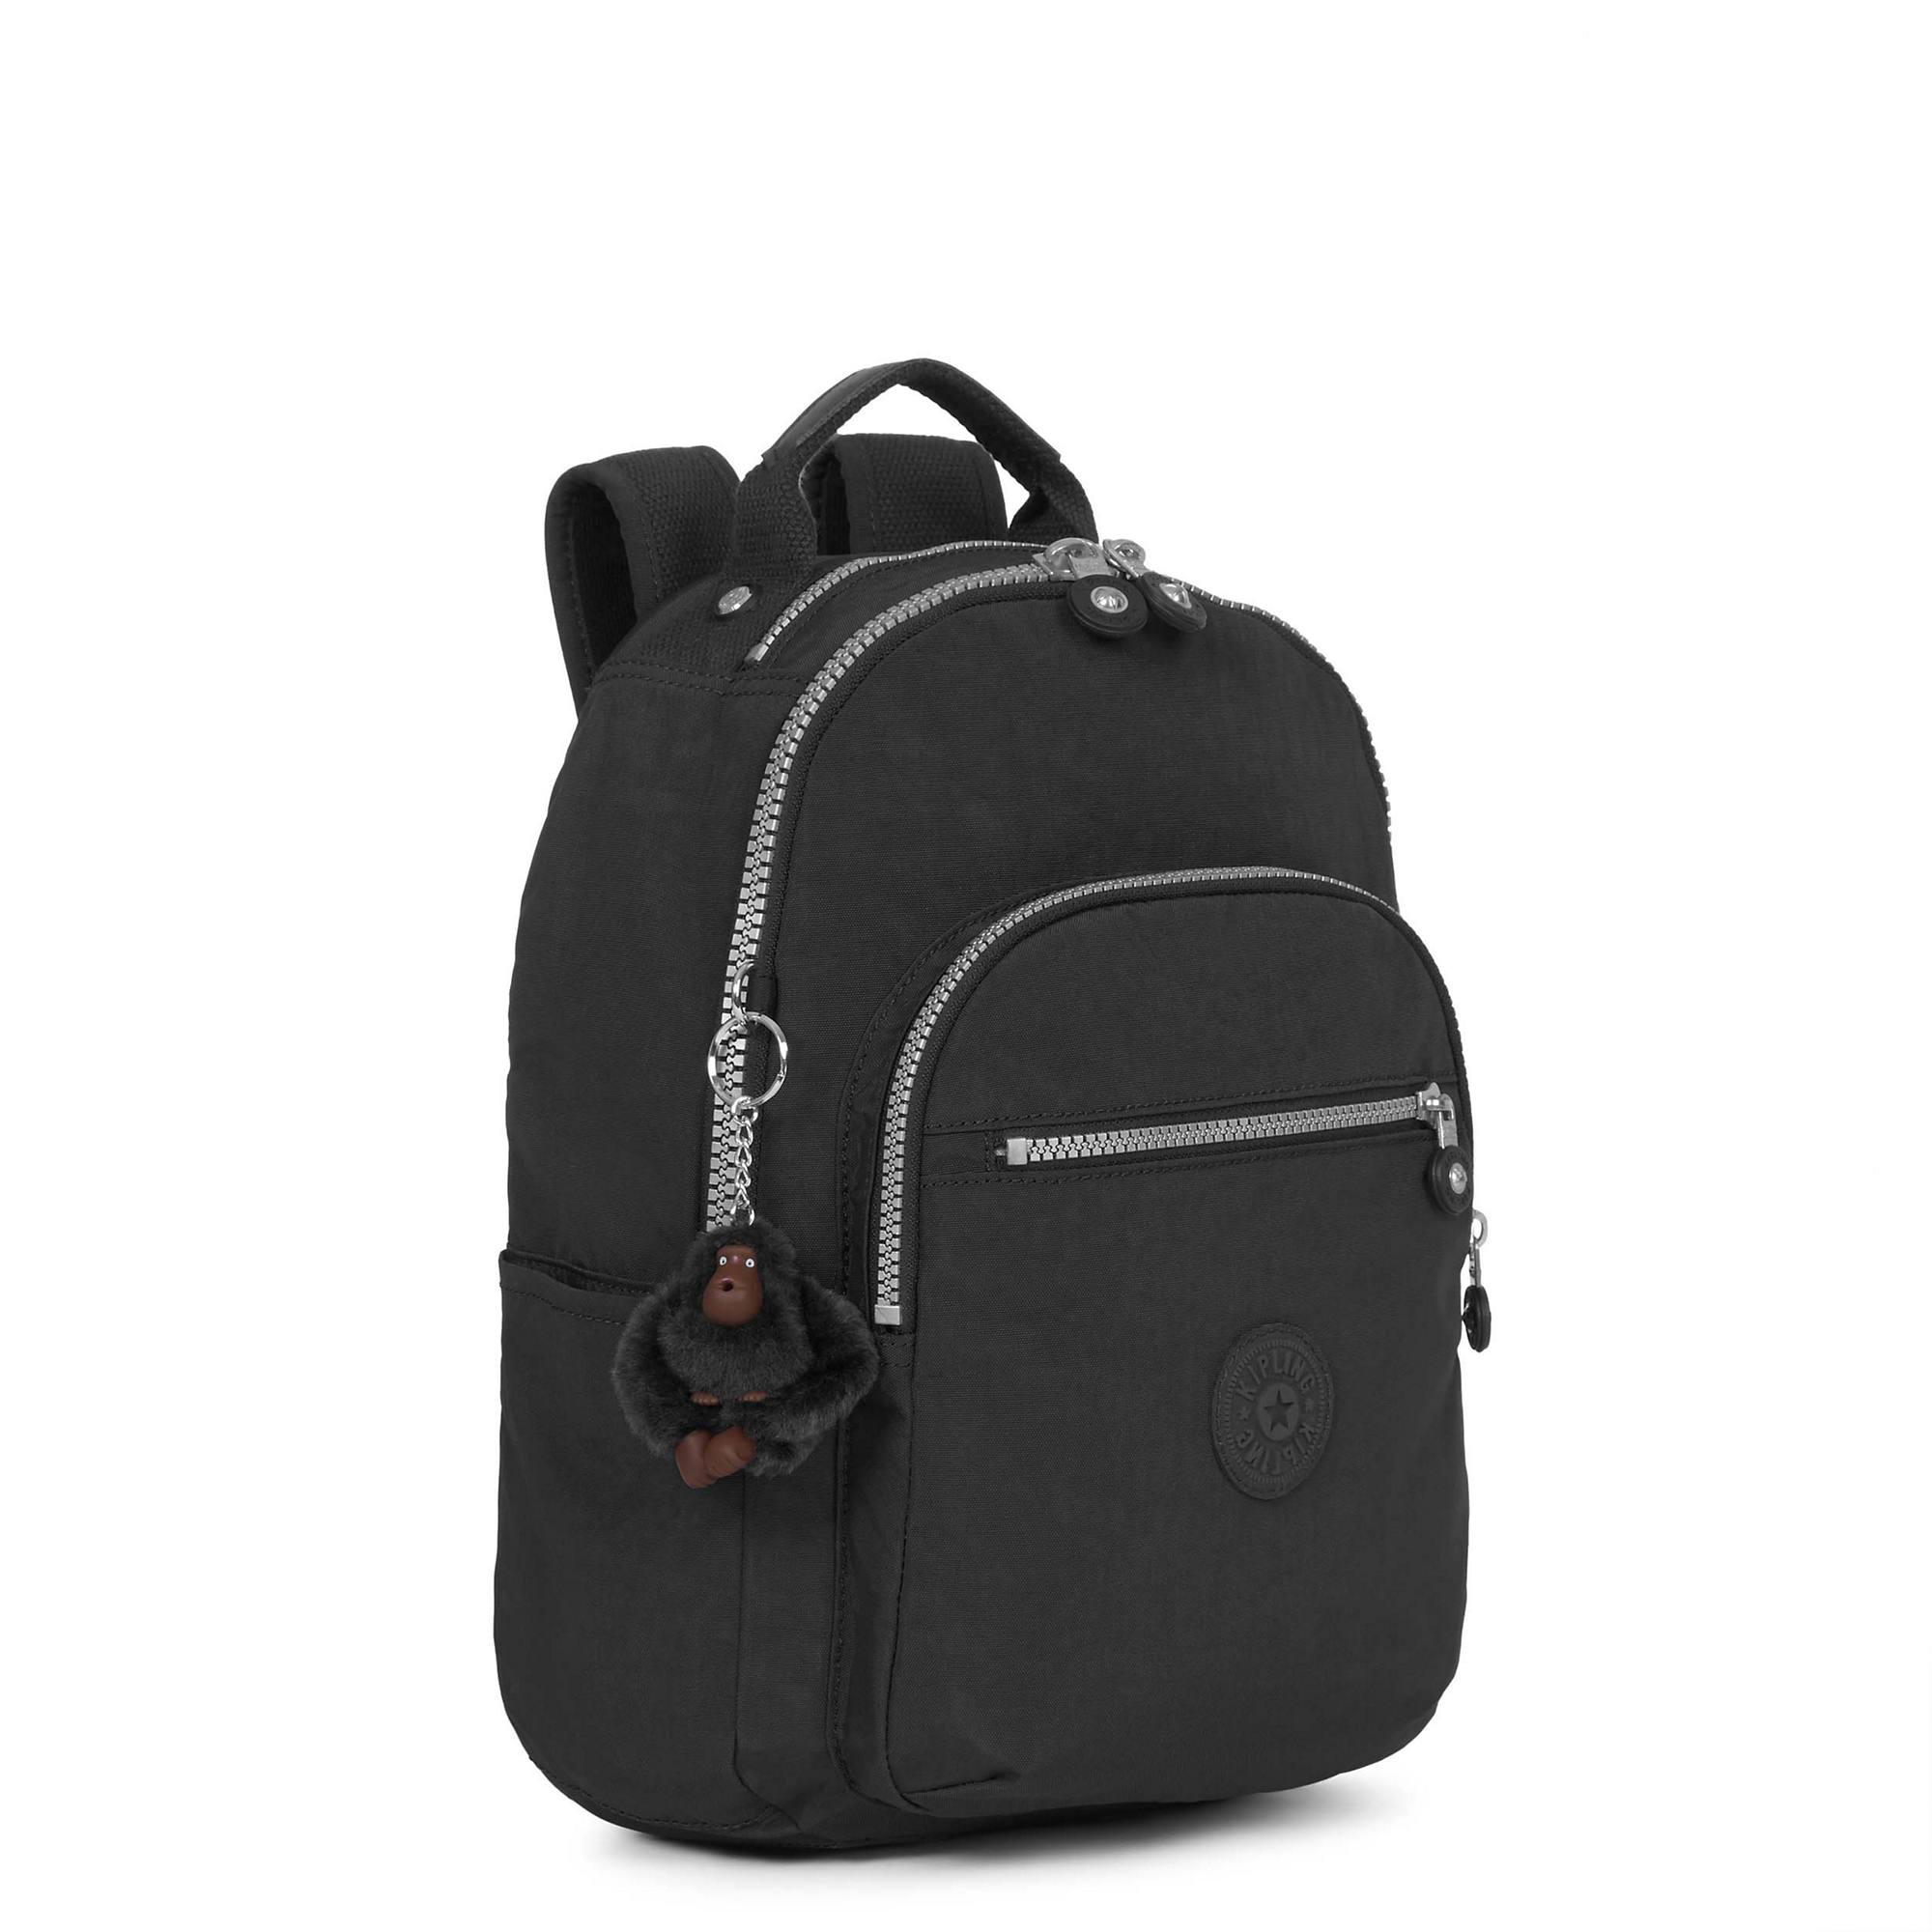 Kipling-Seoul-Small-11-034-Laptop-Backpack thumbnail 5